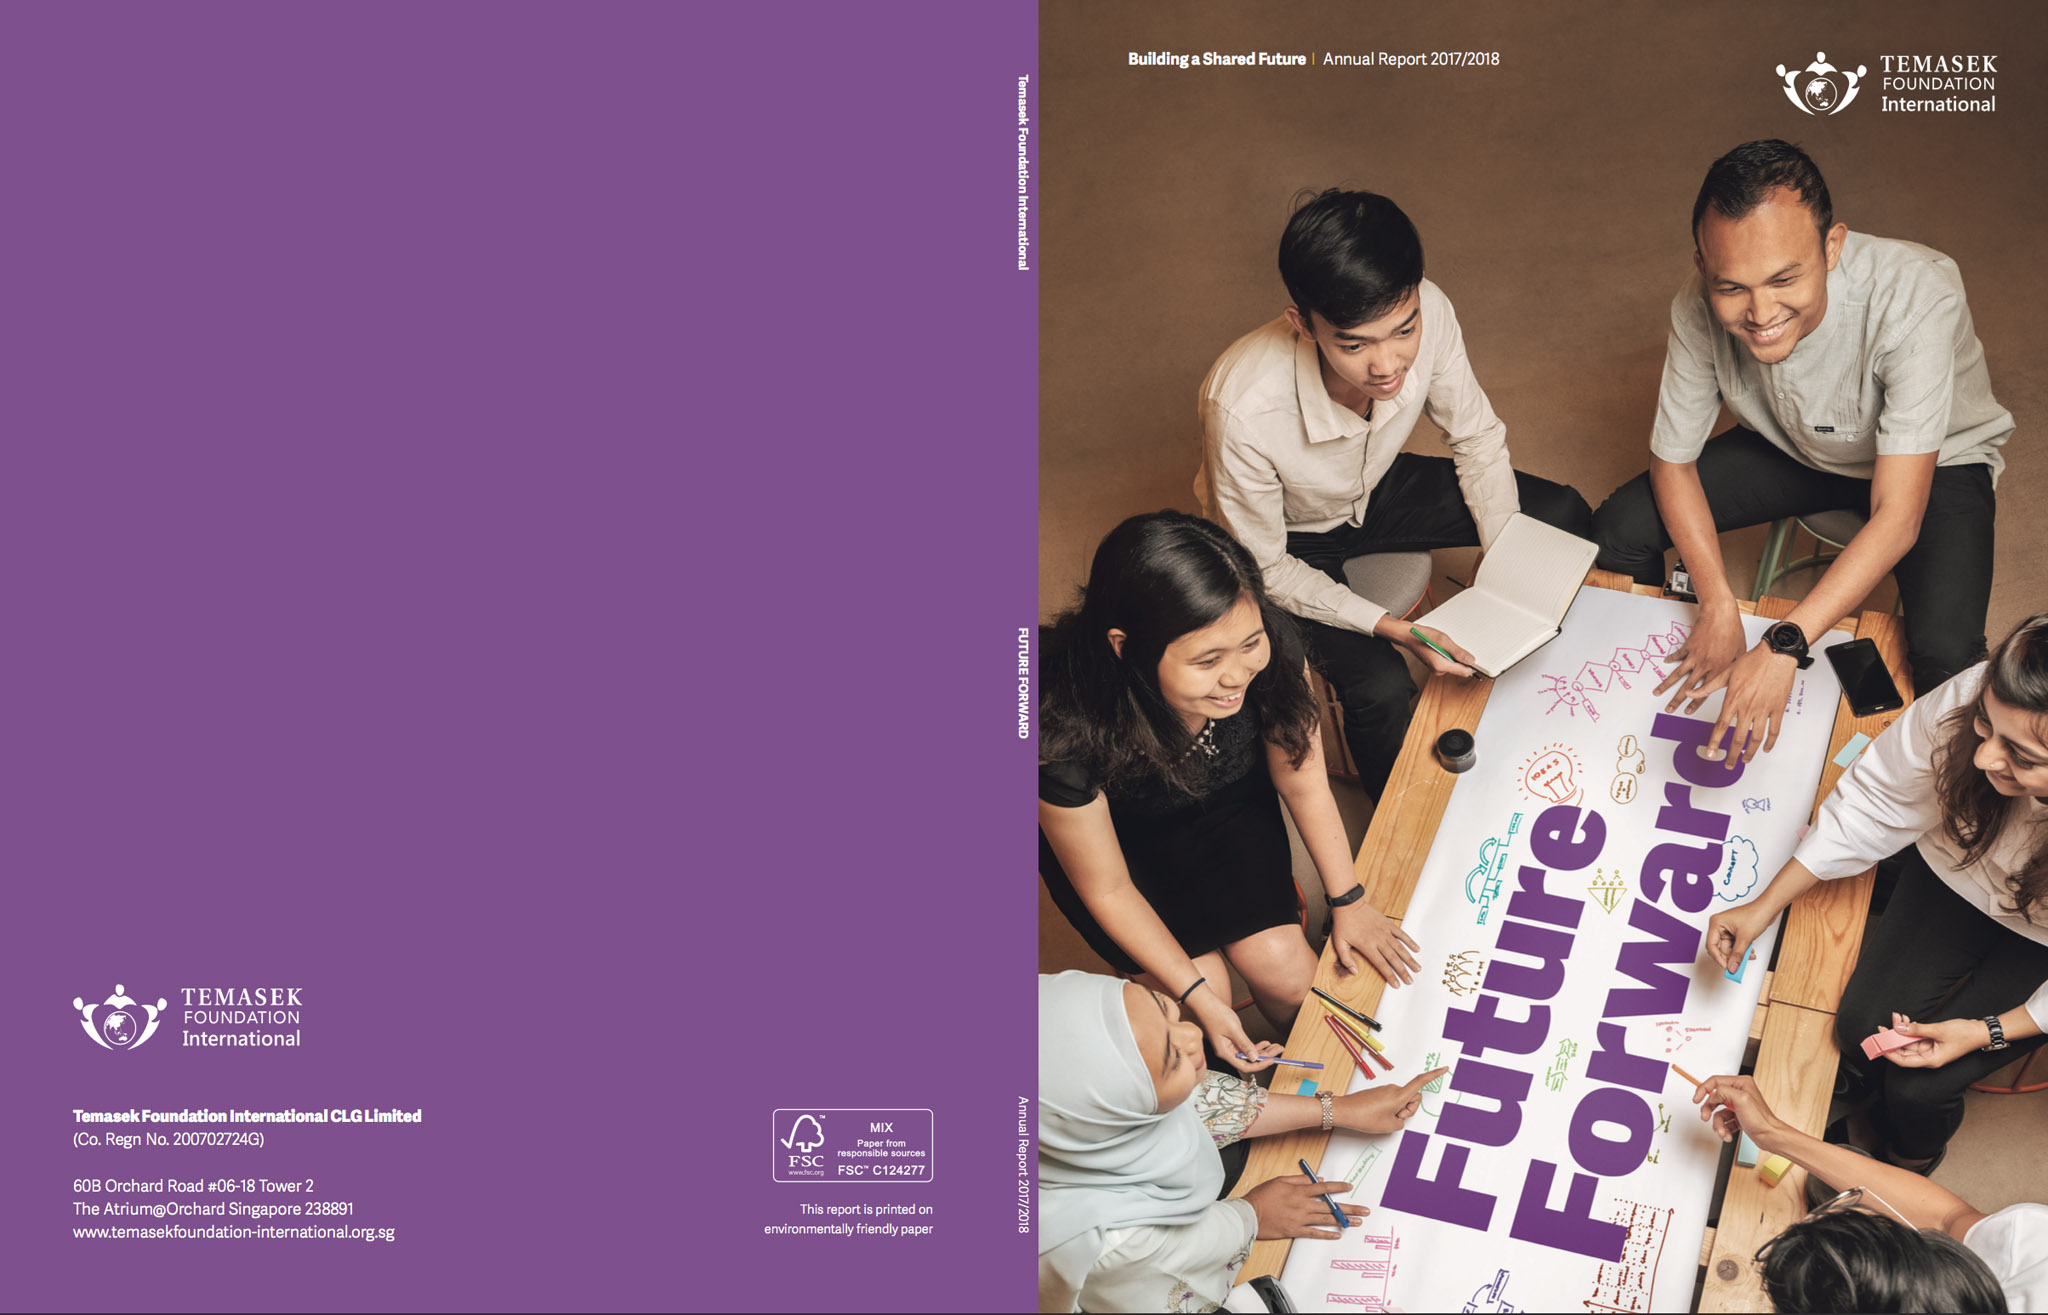 001TFI-AR-2018-Cover-singapore-photographer-editorial-commercial-1_01.jpg